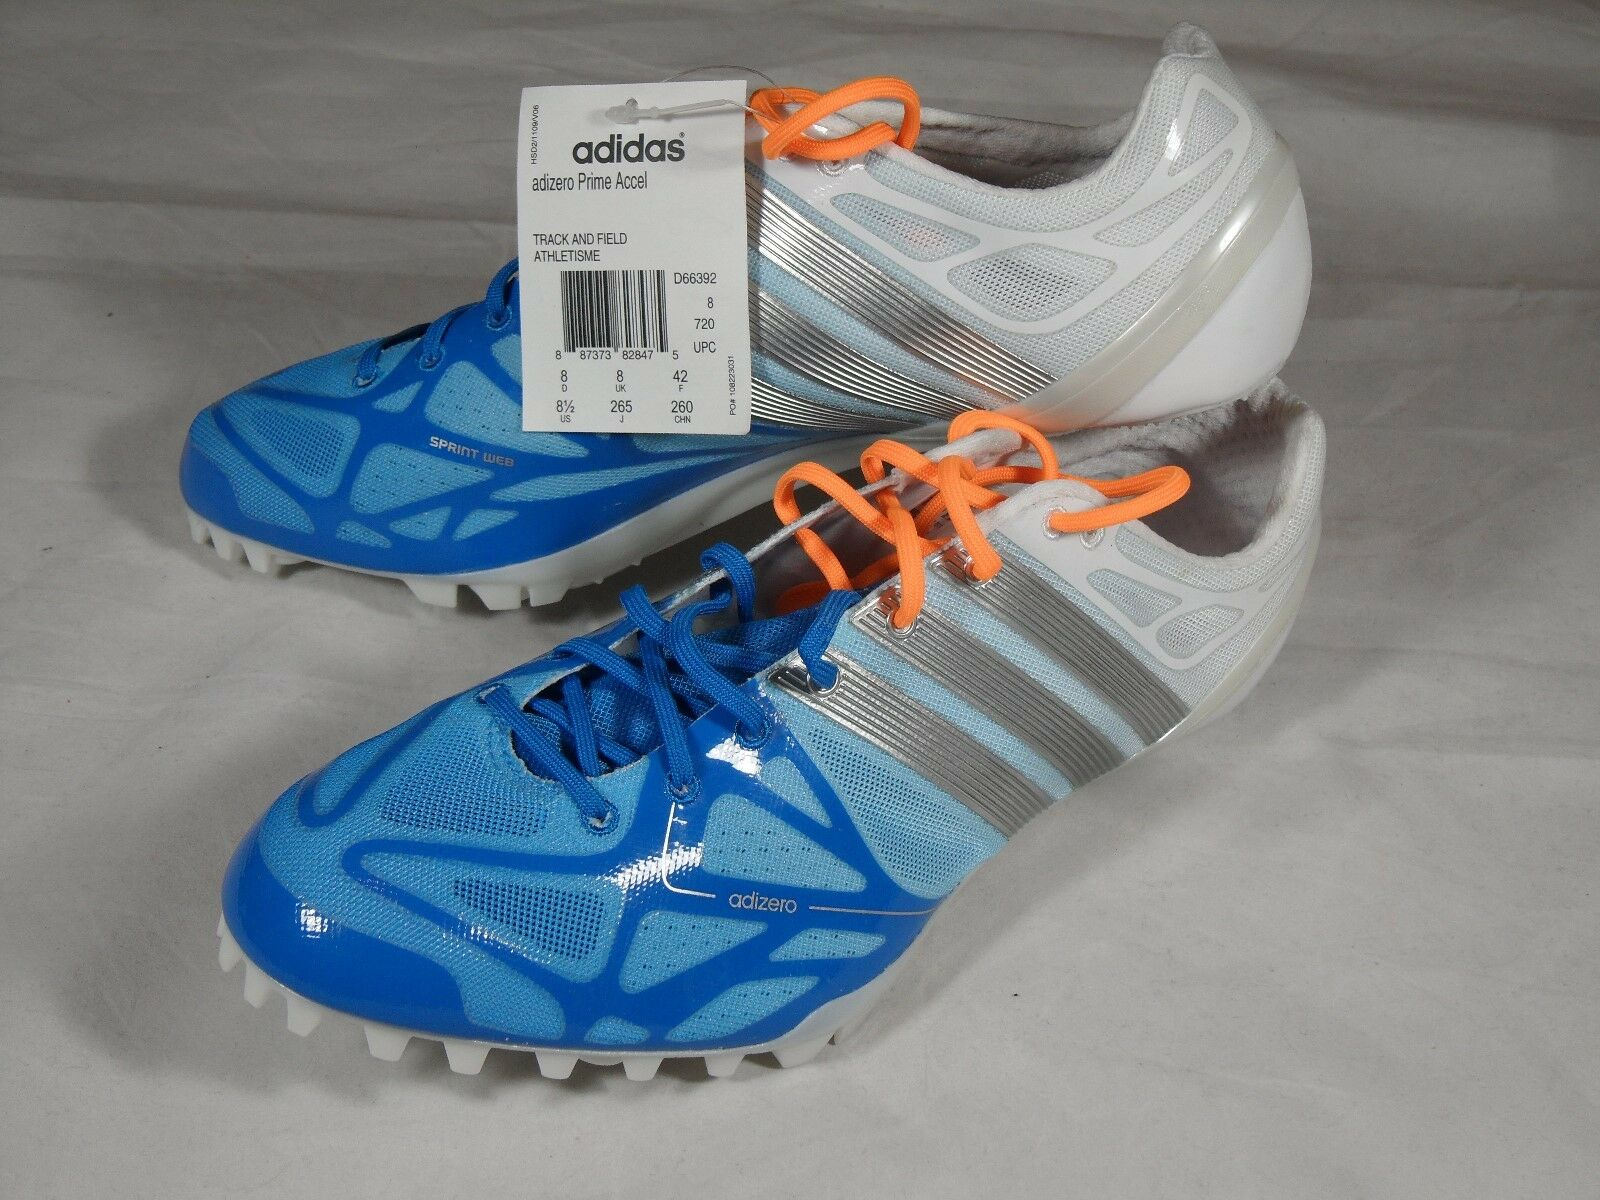 New Adidas Adizero Prime Accel Cadence 2 SP Avanti 2 LJ 2 MD Track Field Spikes